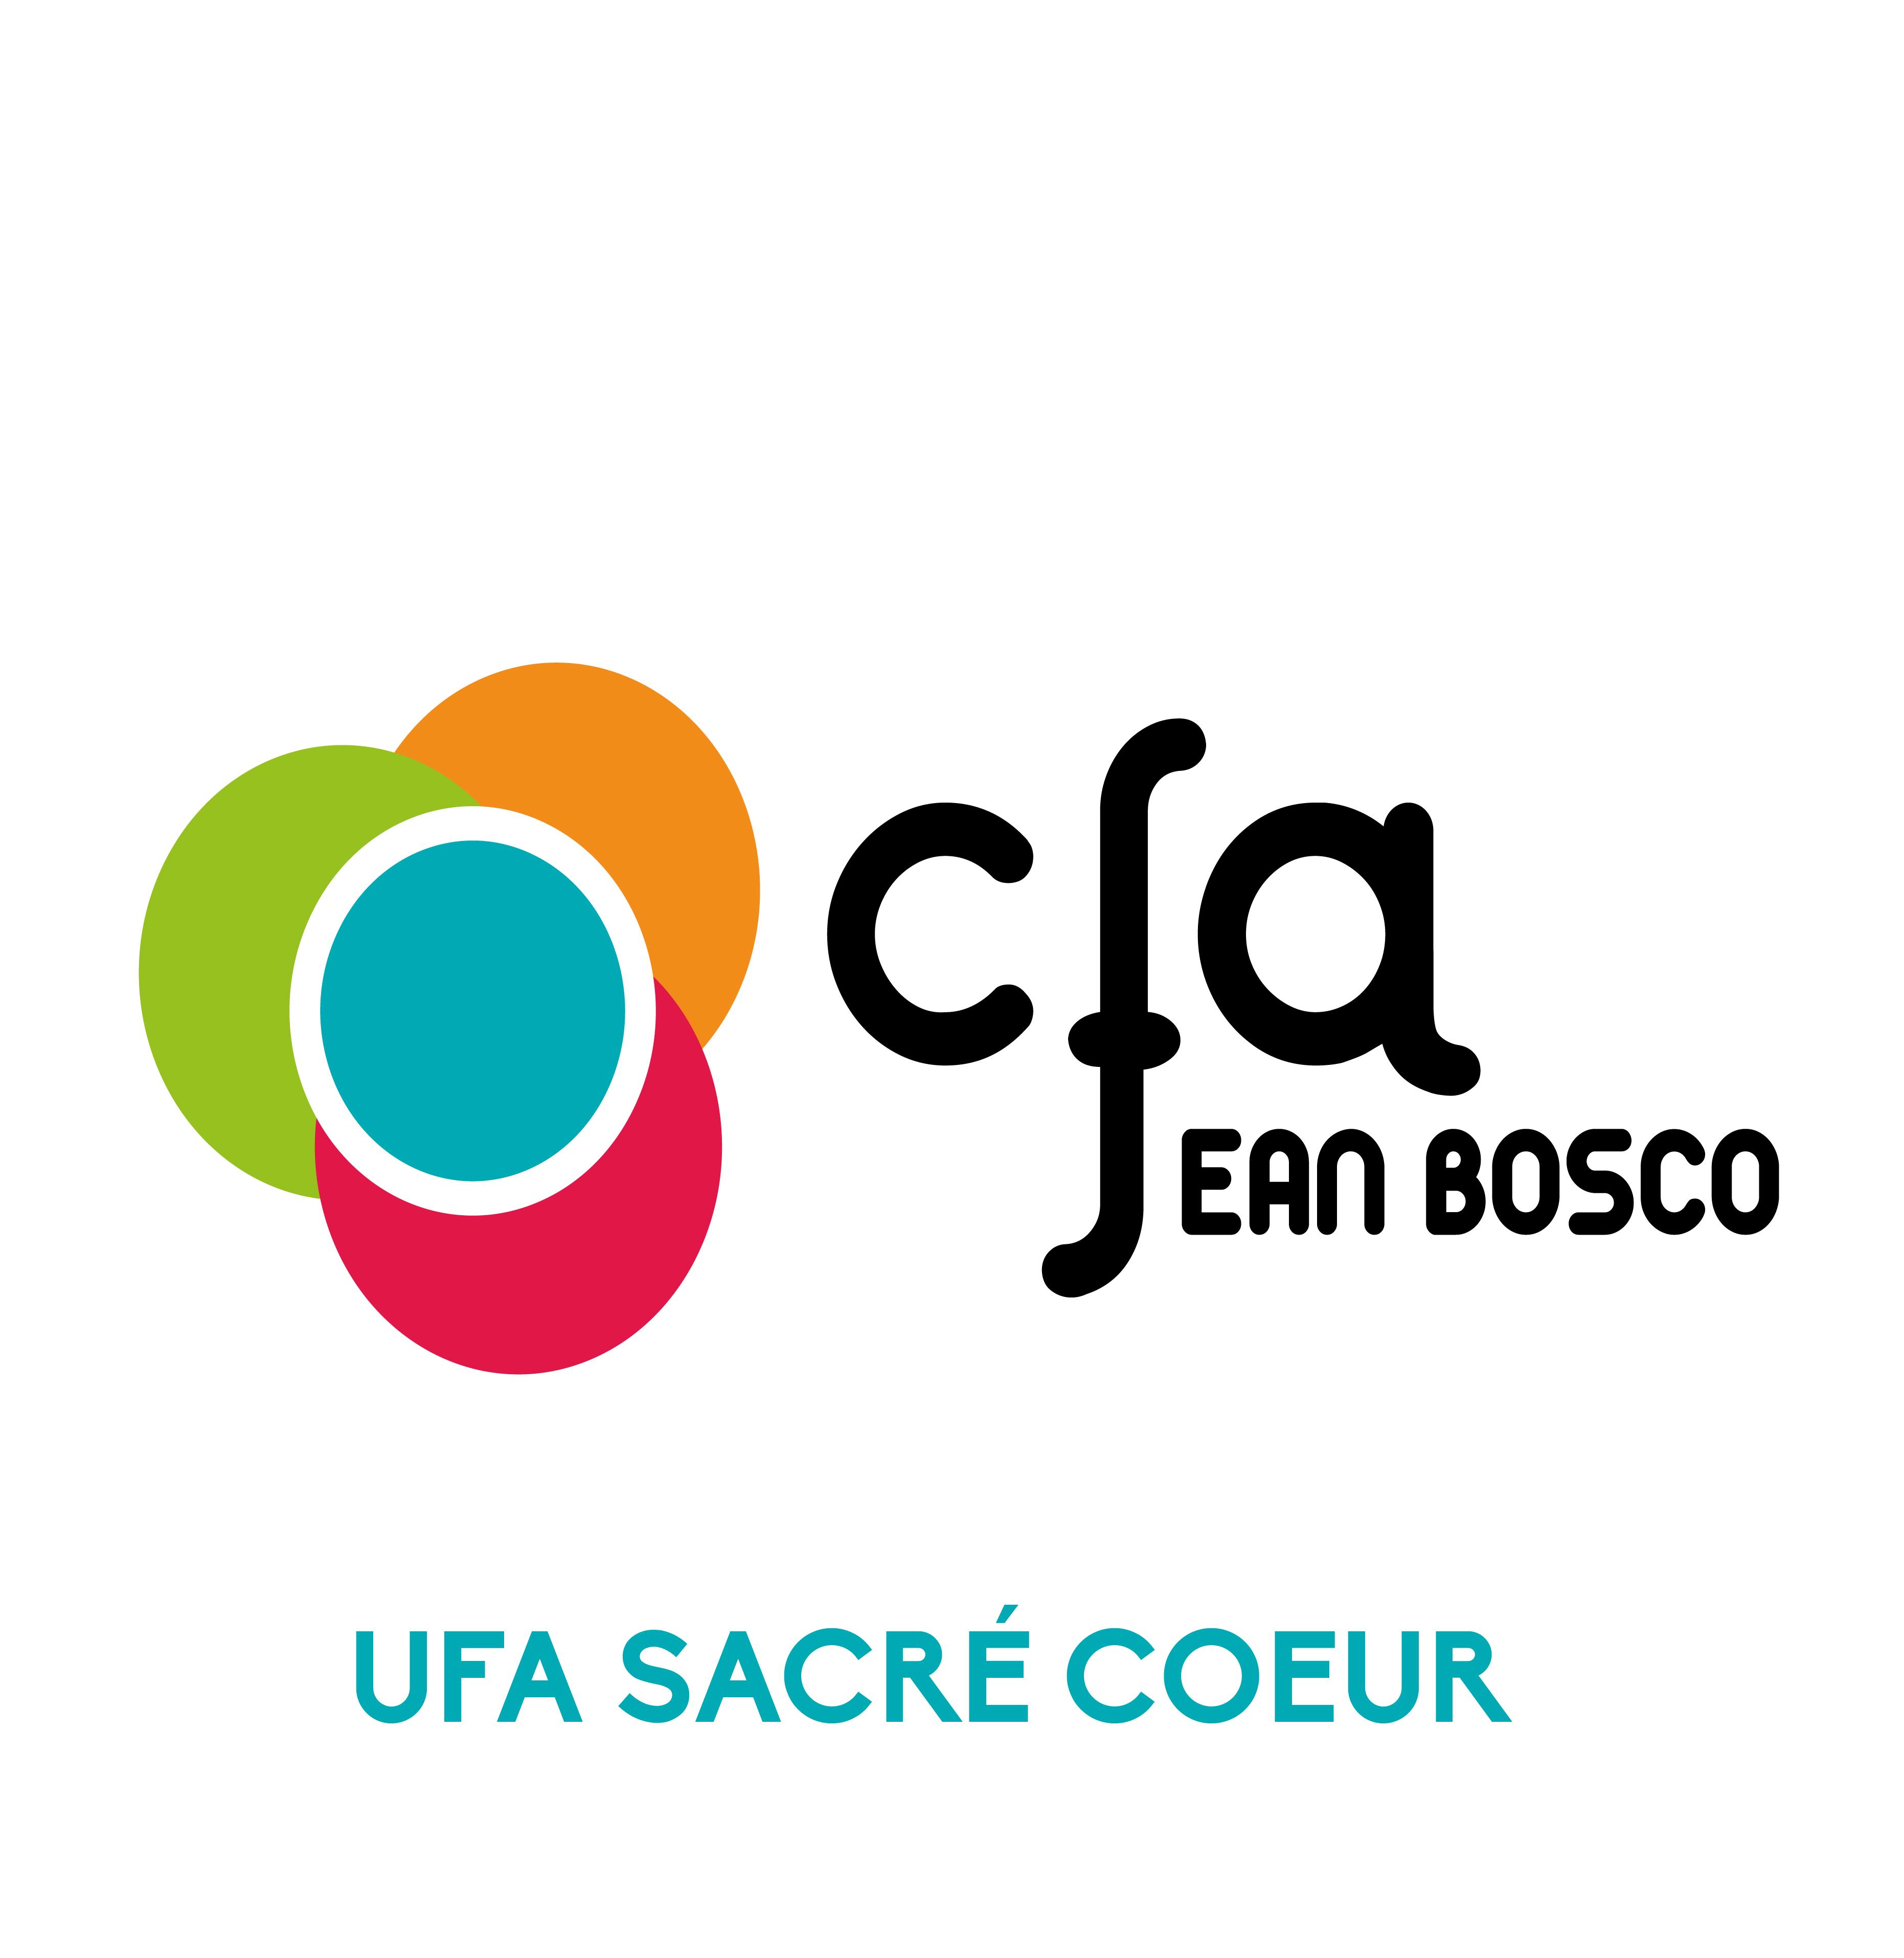 LOGO CFA-SACRE-COEUR